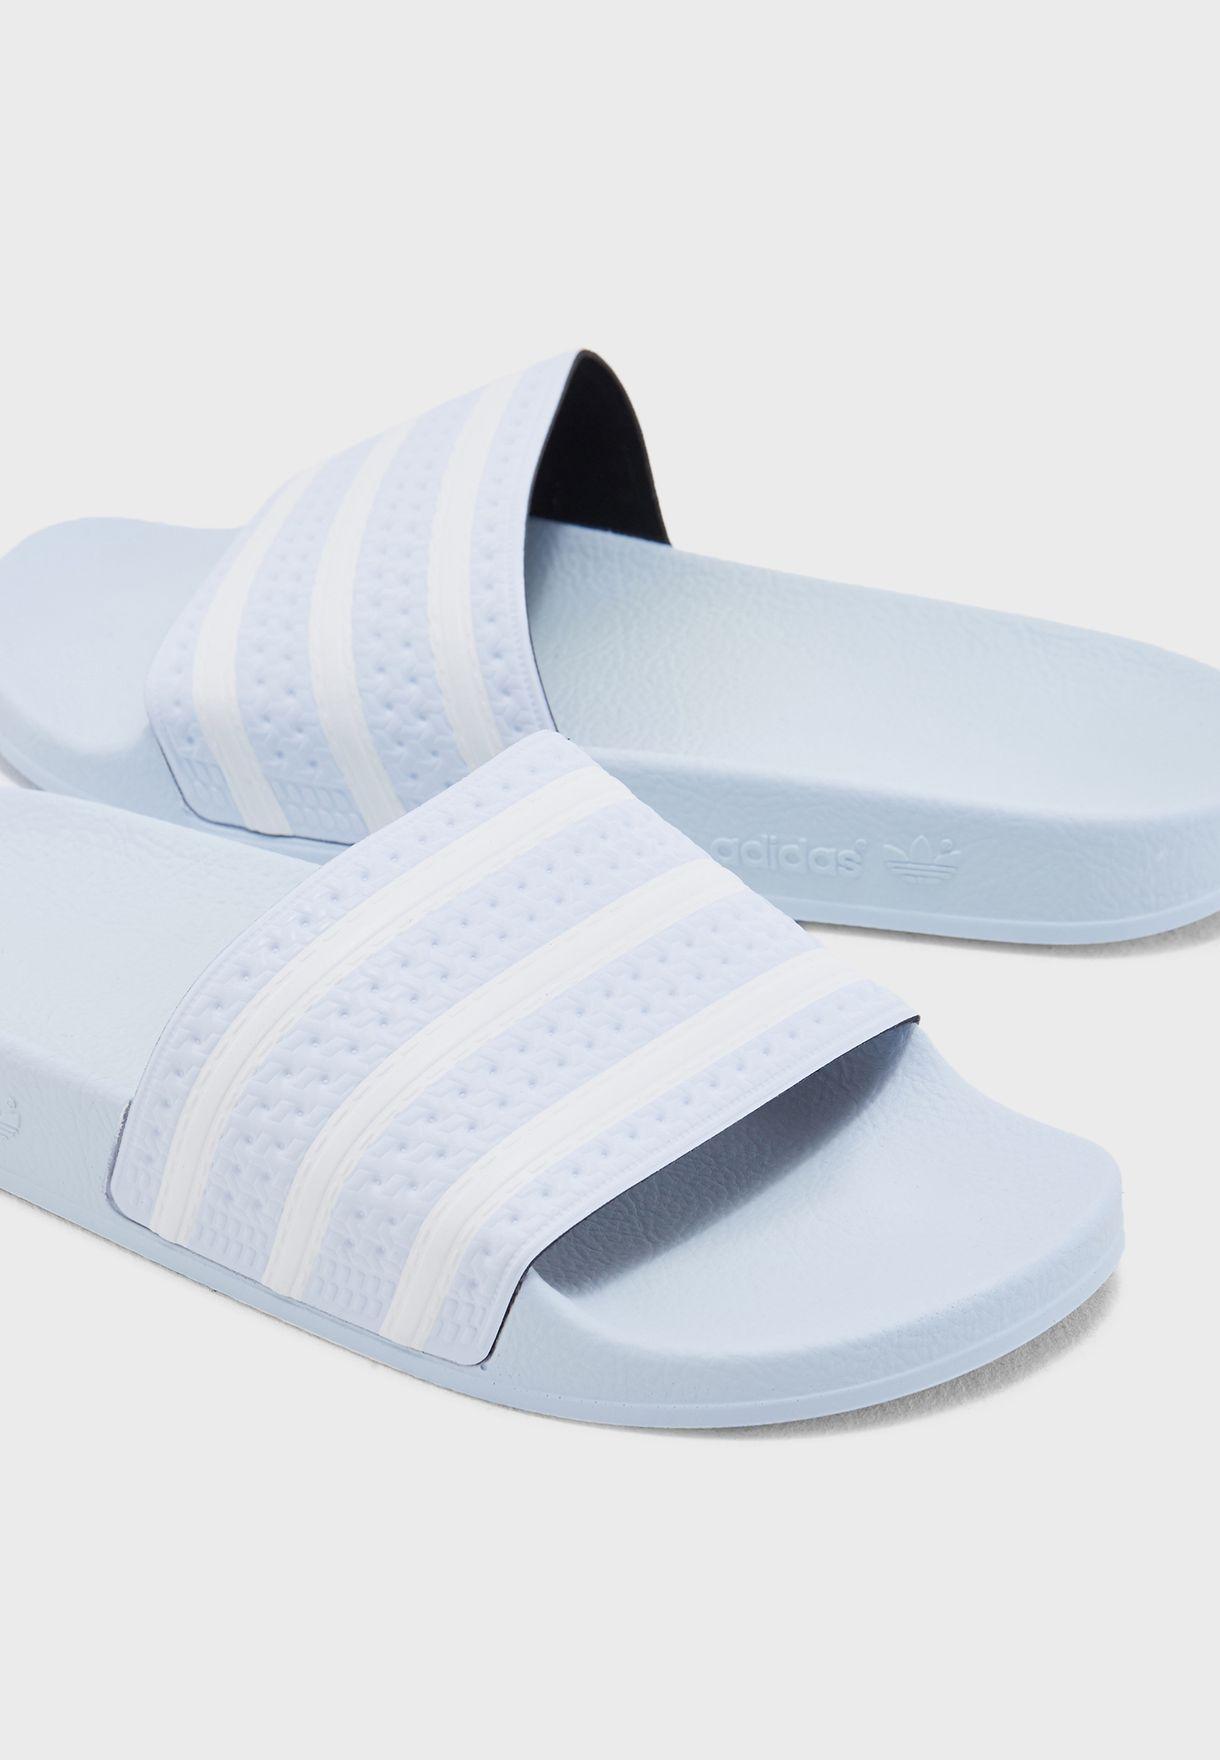 eb0a86f81 Shop adidas Originals blue Adilette Slides AQ1068 for Men in UAE ...